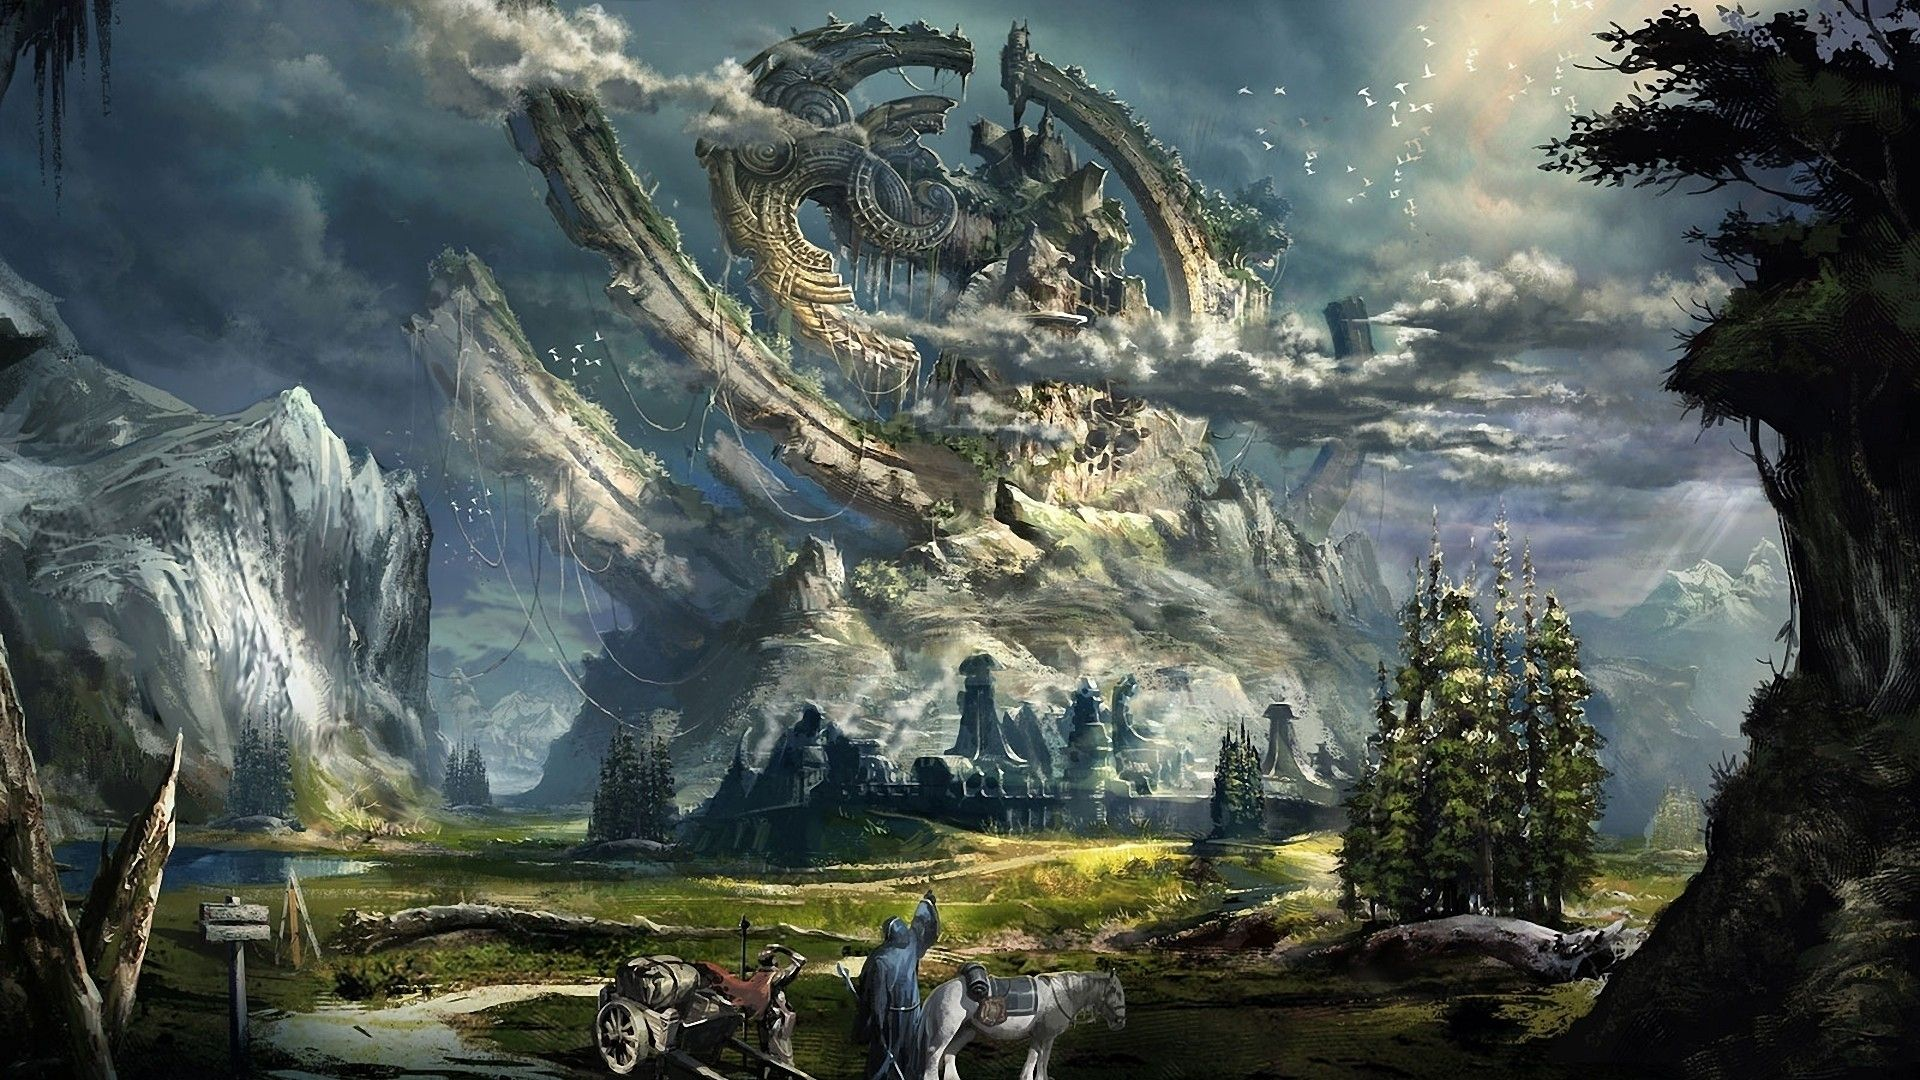 mage video games fantasy art horses artwork tera online